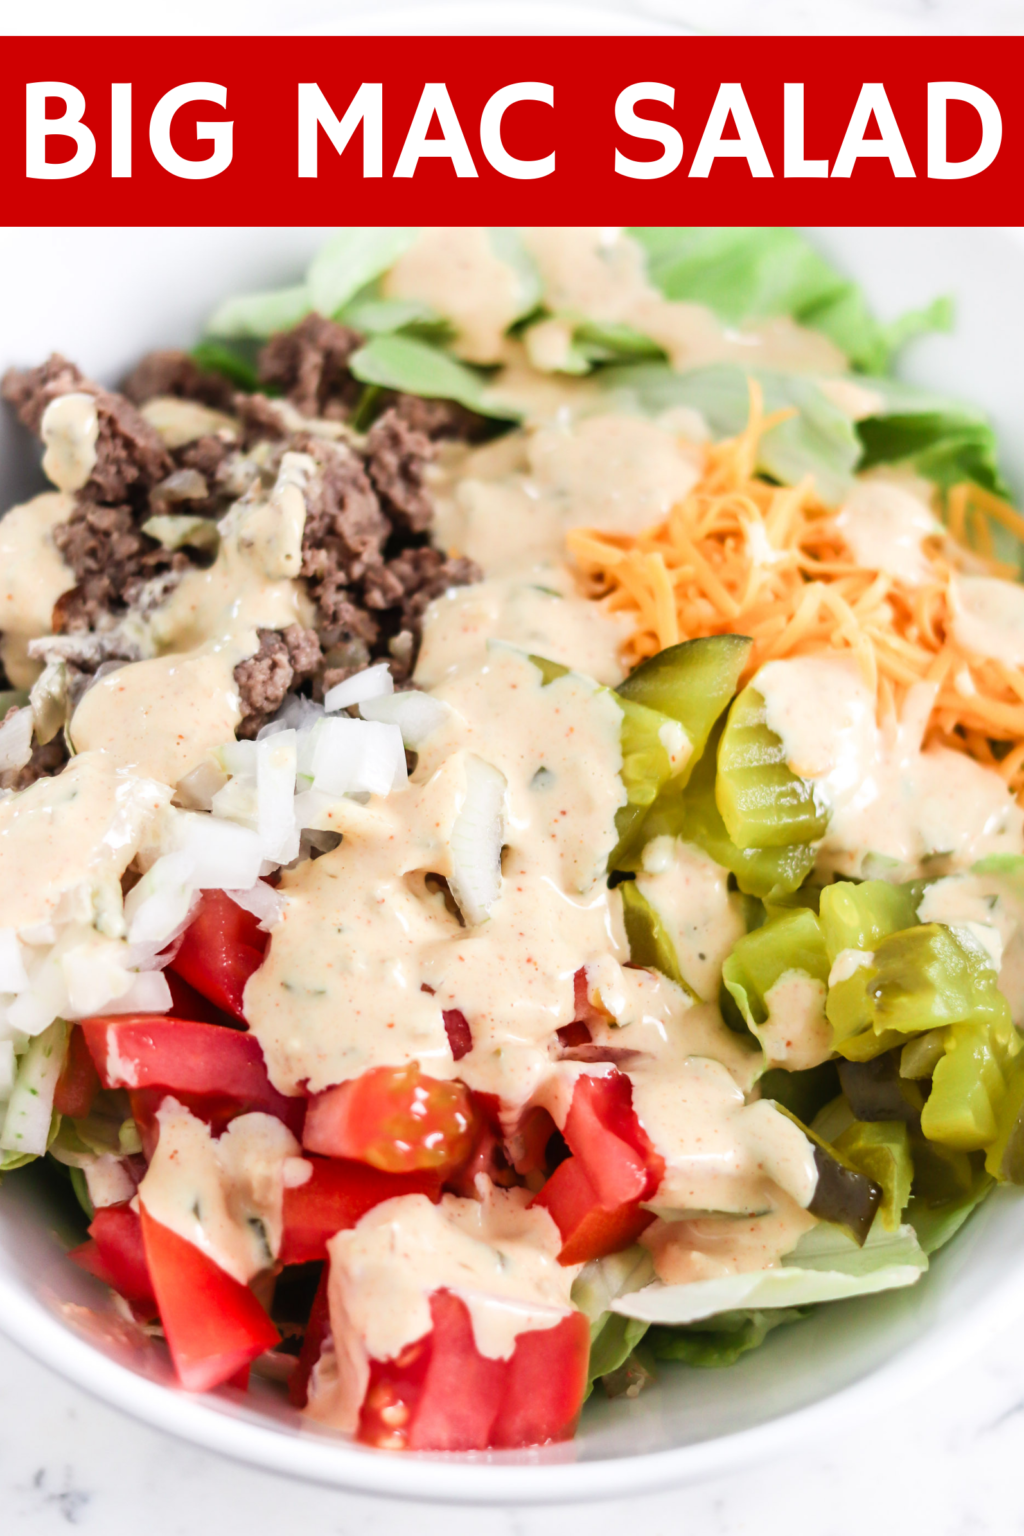 Big Mac Salad (Low Carb)